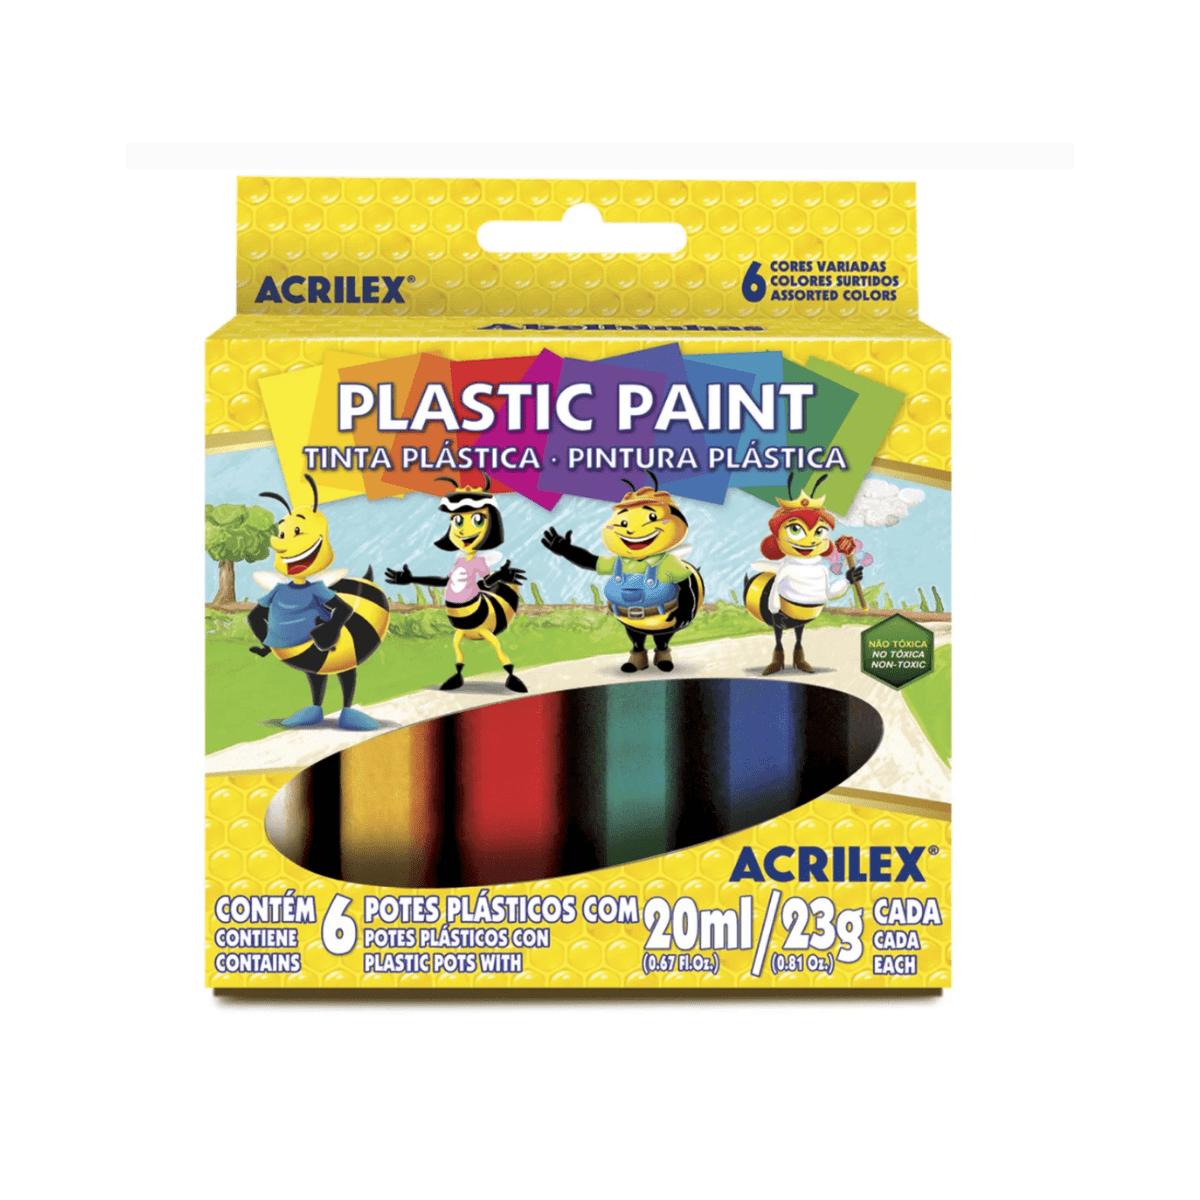 Tinta Plástica c/ 6 - Acrilex